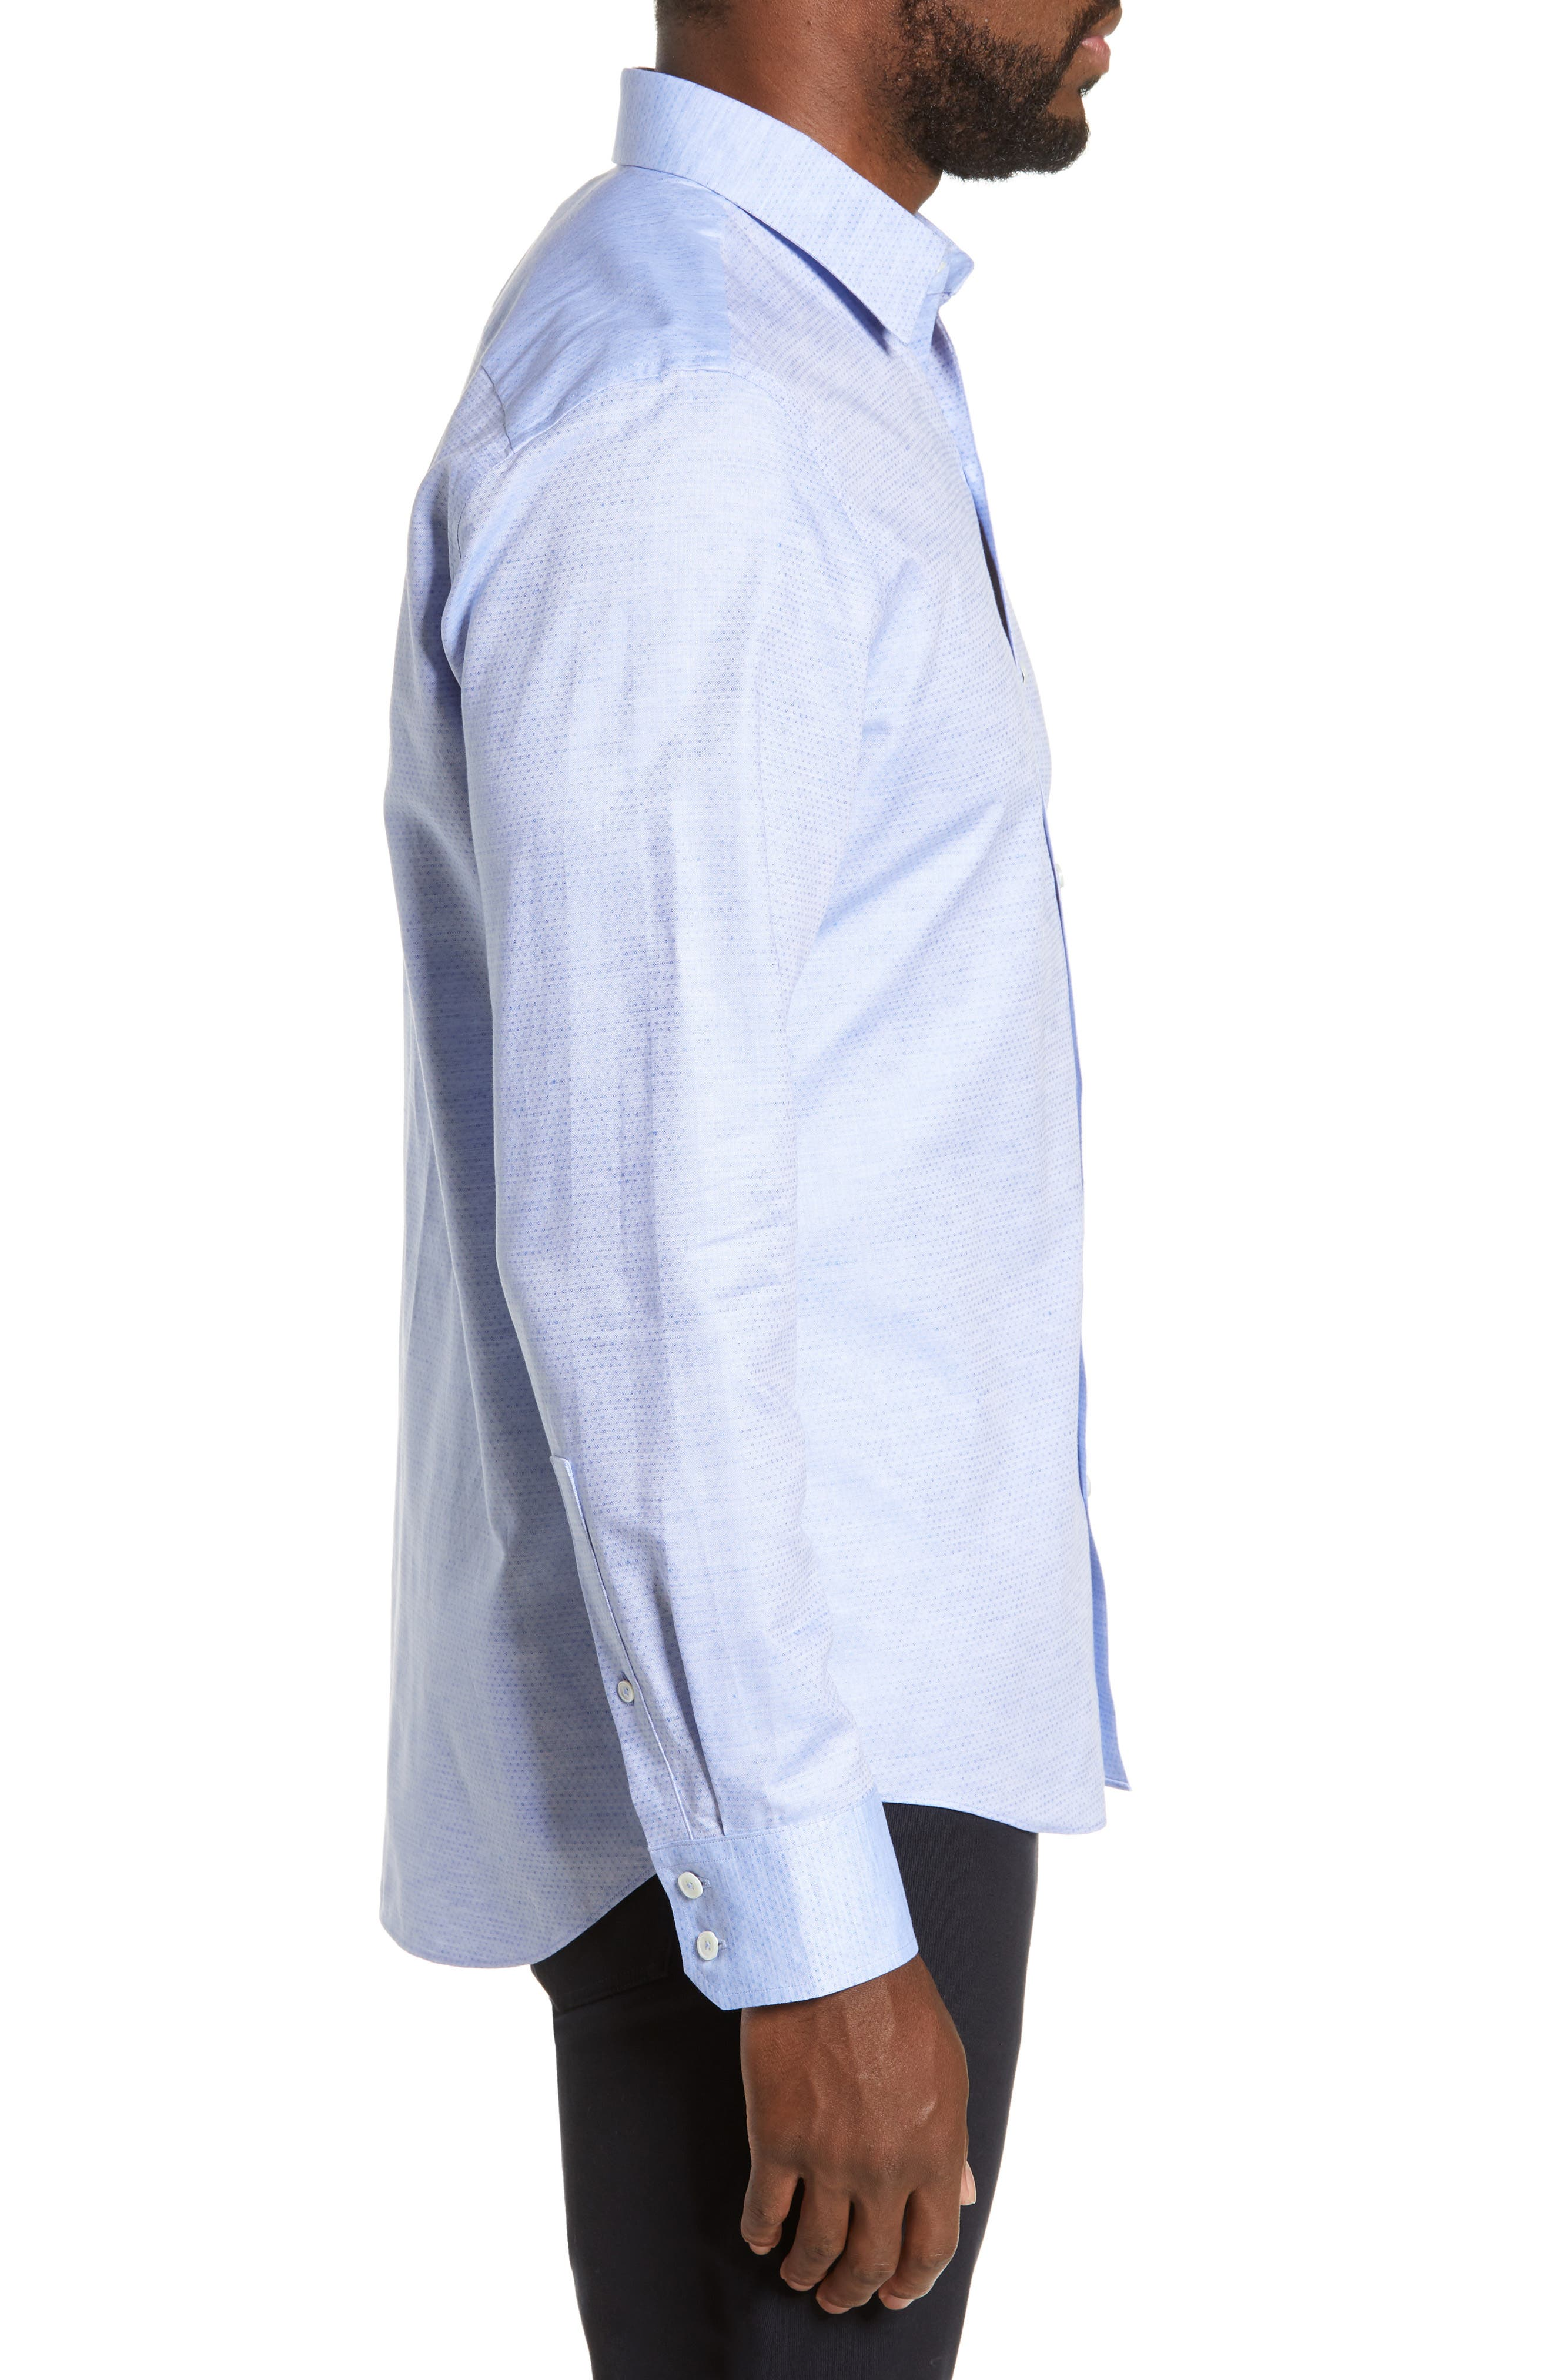 ZACHARY PRELL, Alfano Regular Fit Cotton & Linen Sport Shirt, Alternate thumbnail 4, color, LT BLUE